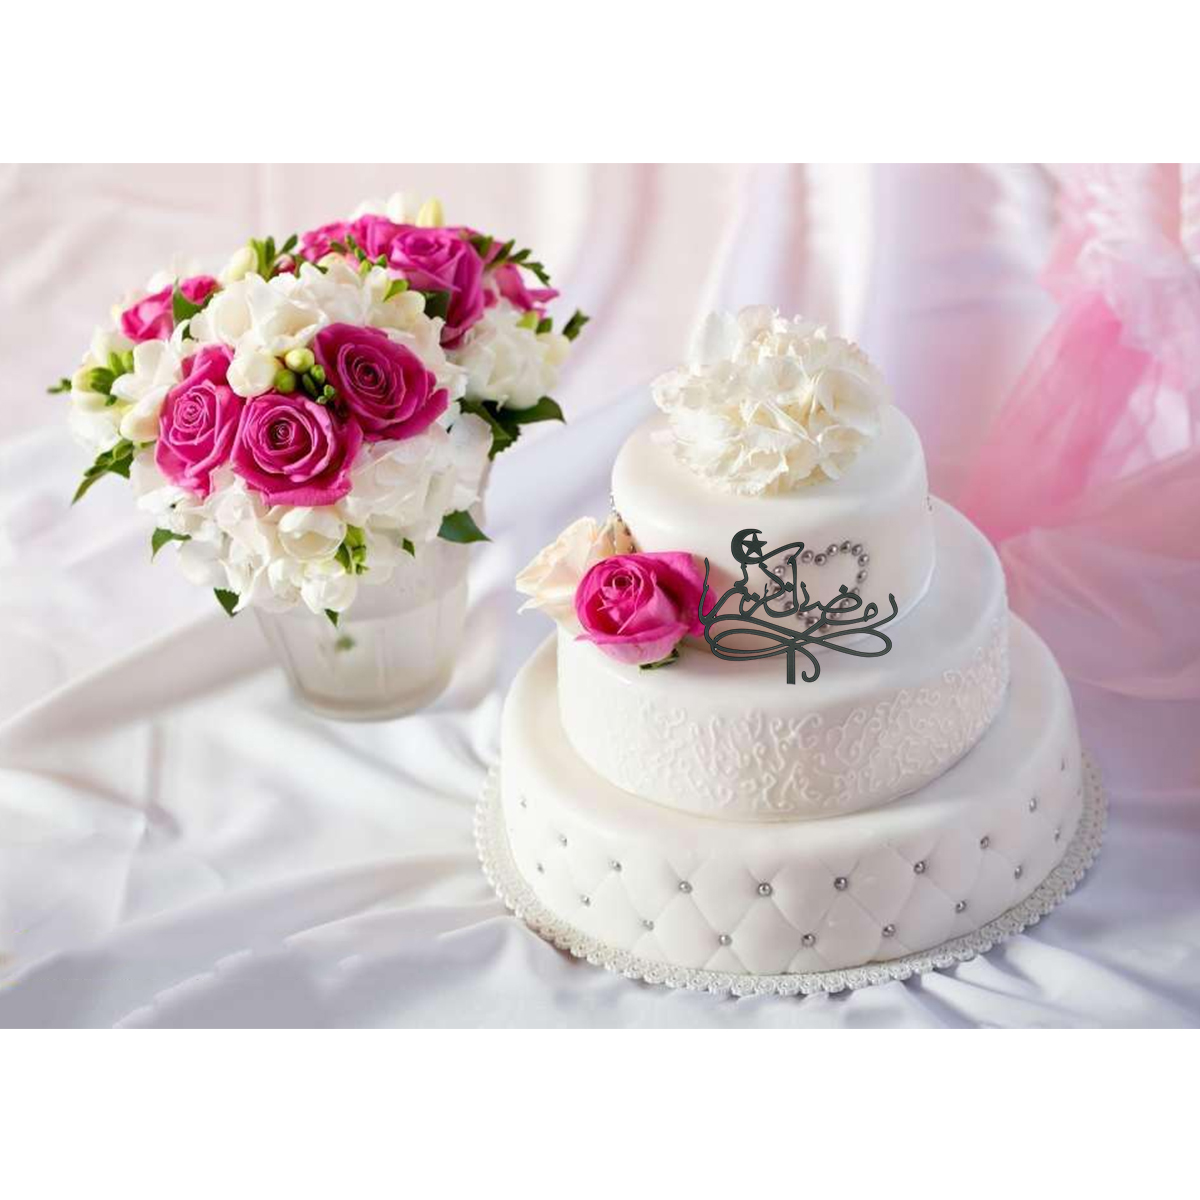 Cake Topper Muslim Islam Eid Mubarak Festival Acrylic Mirror Cupcake Flag Food Pick Favors Supplies for Eid Decor